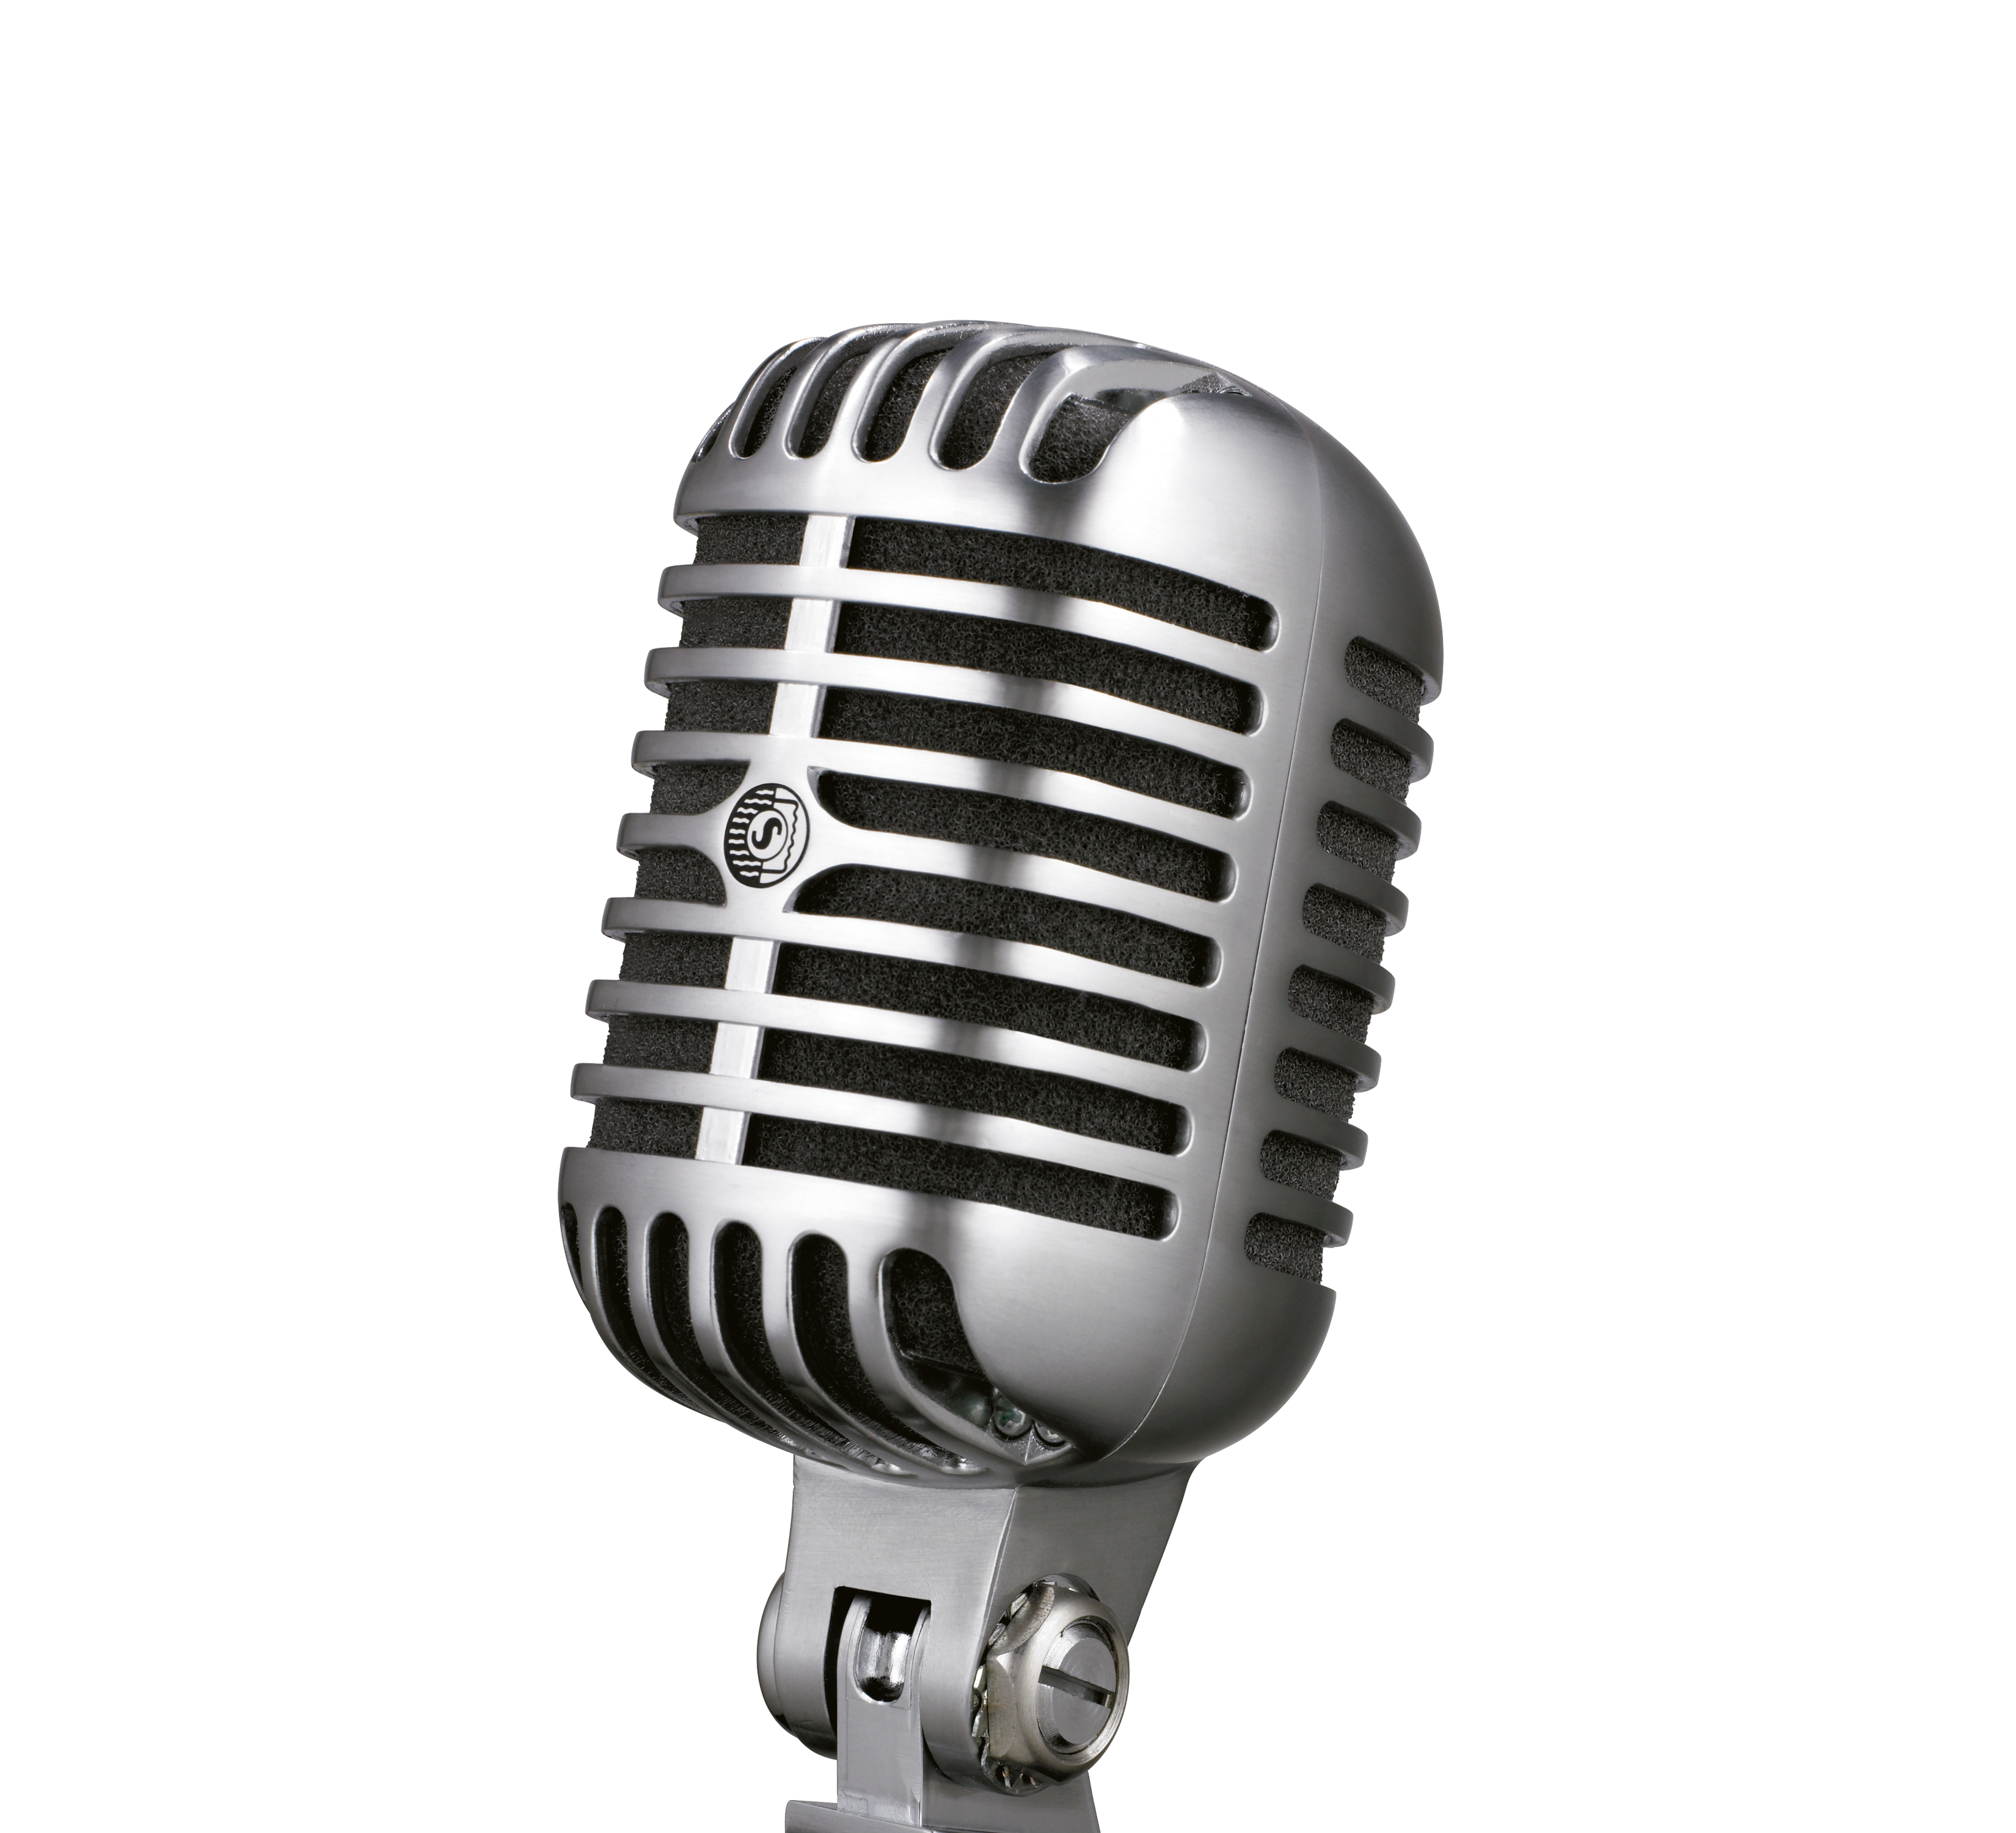 3300x3000 Shure Microphones, Wireless Microphones, In Ear Monitoring